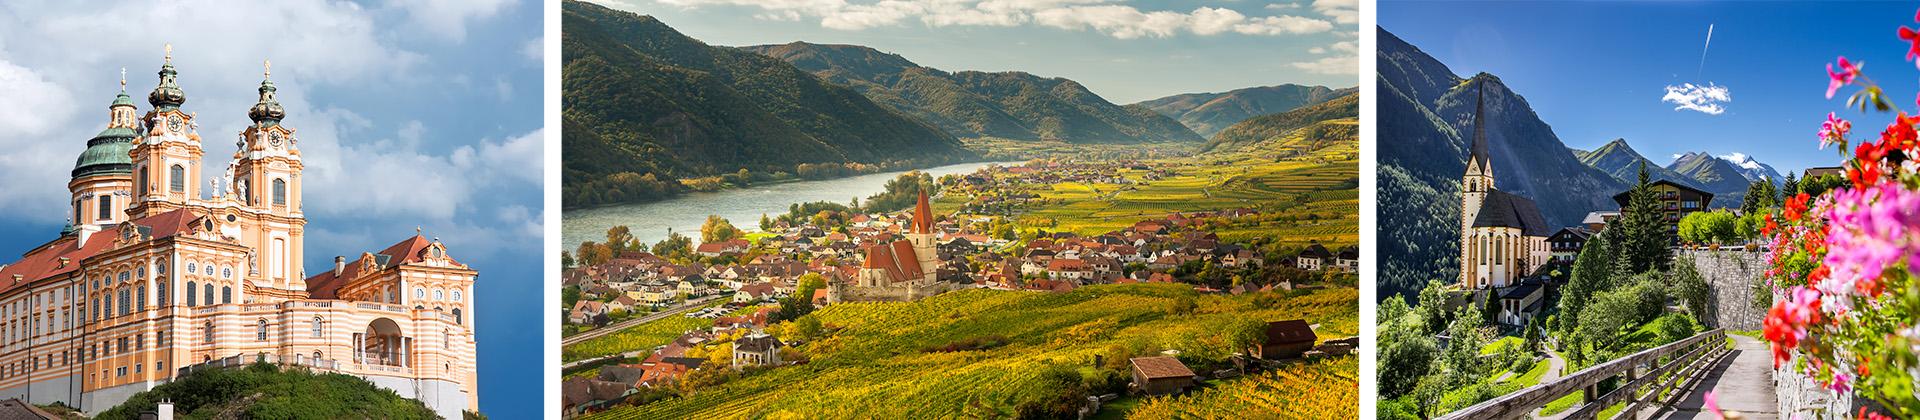 Die tolle Frühlingslandschaft Niederösterreichs im April